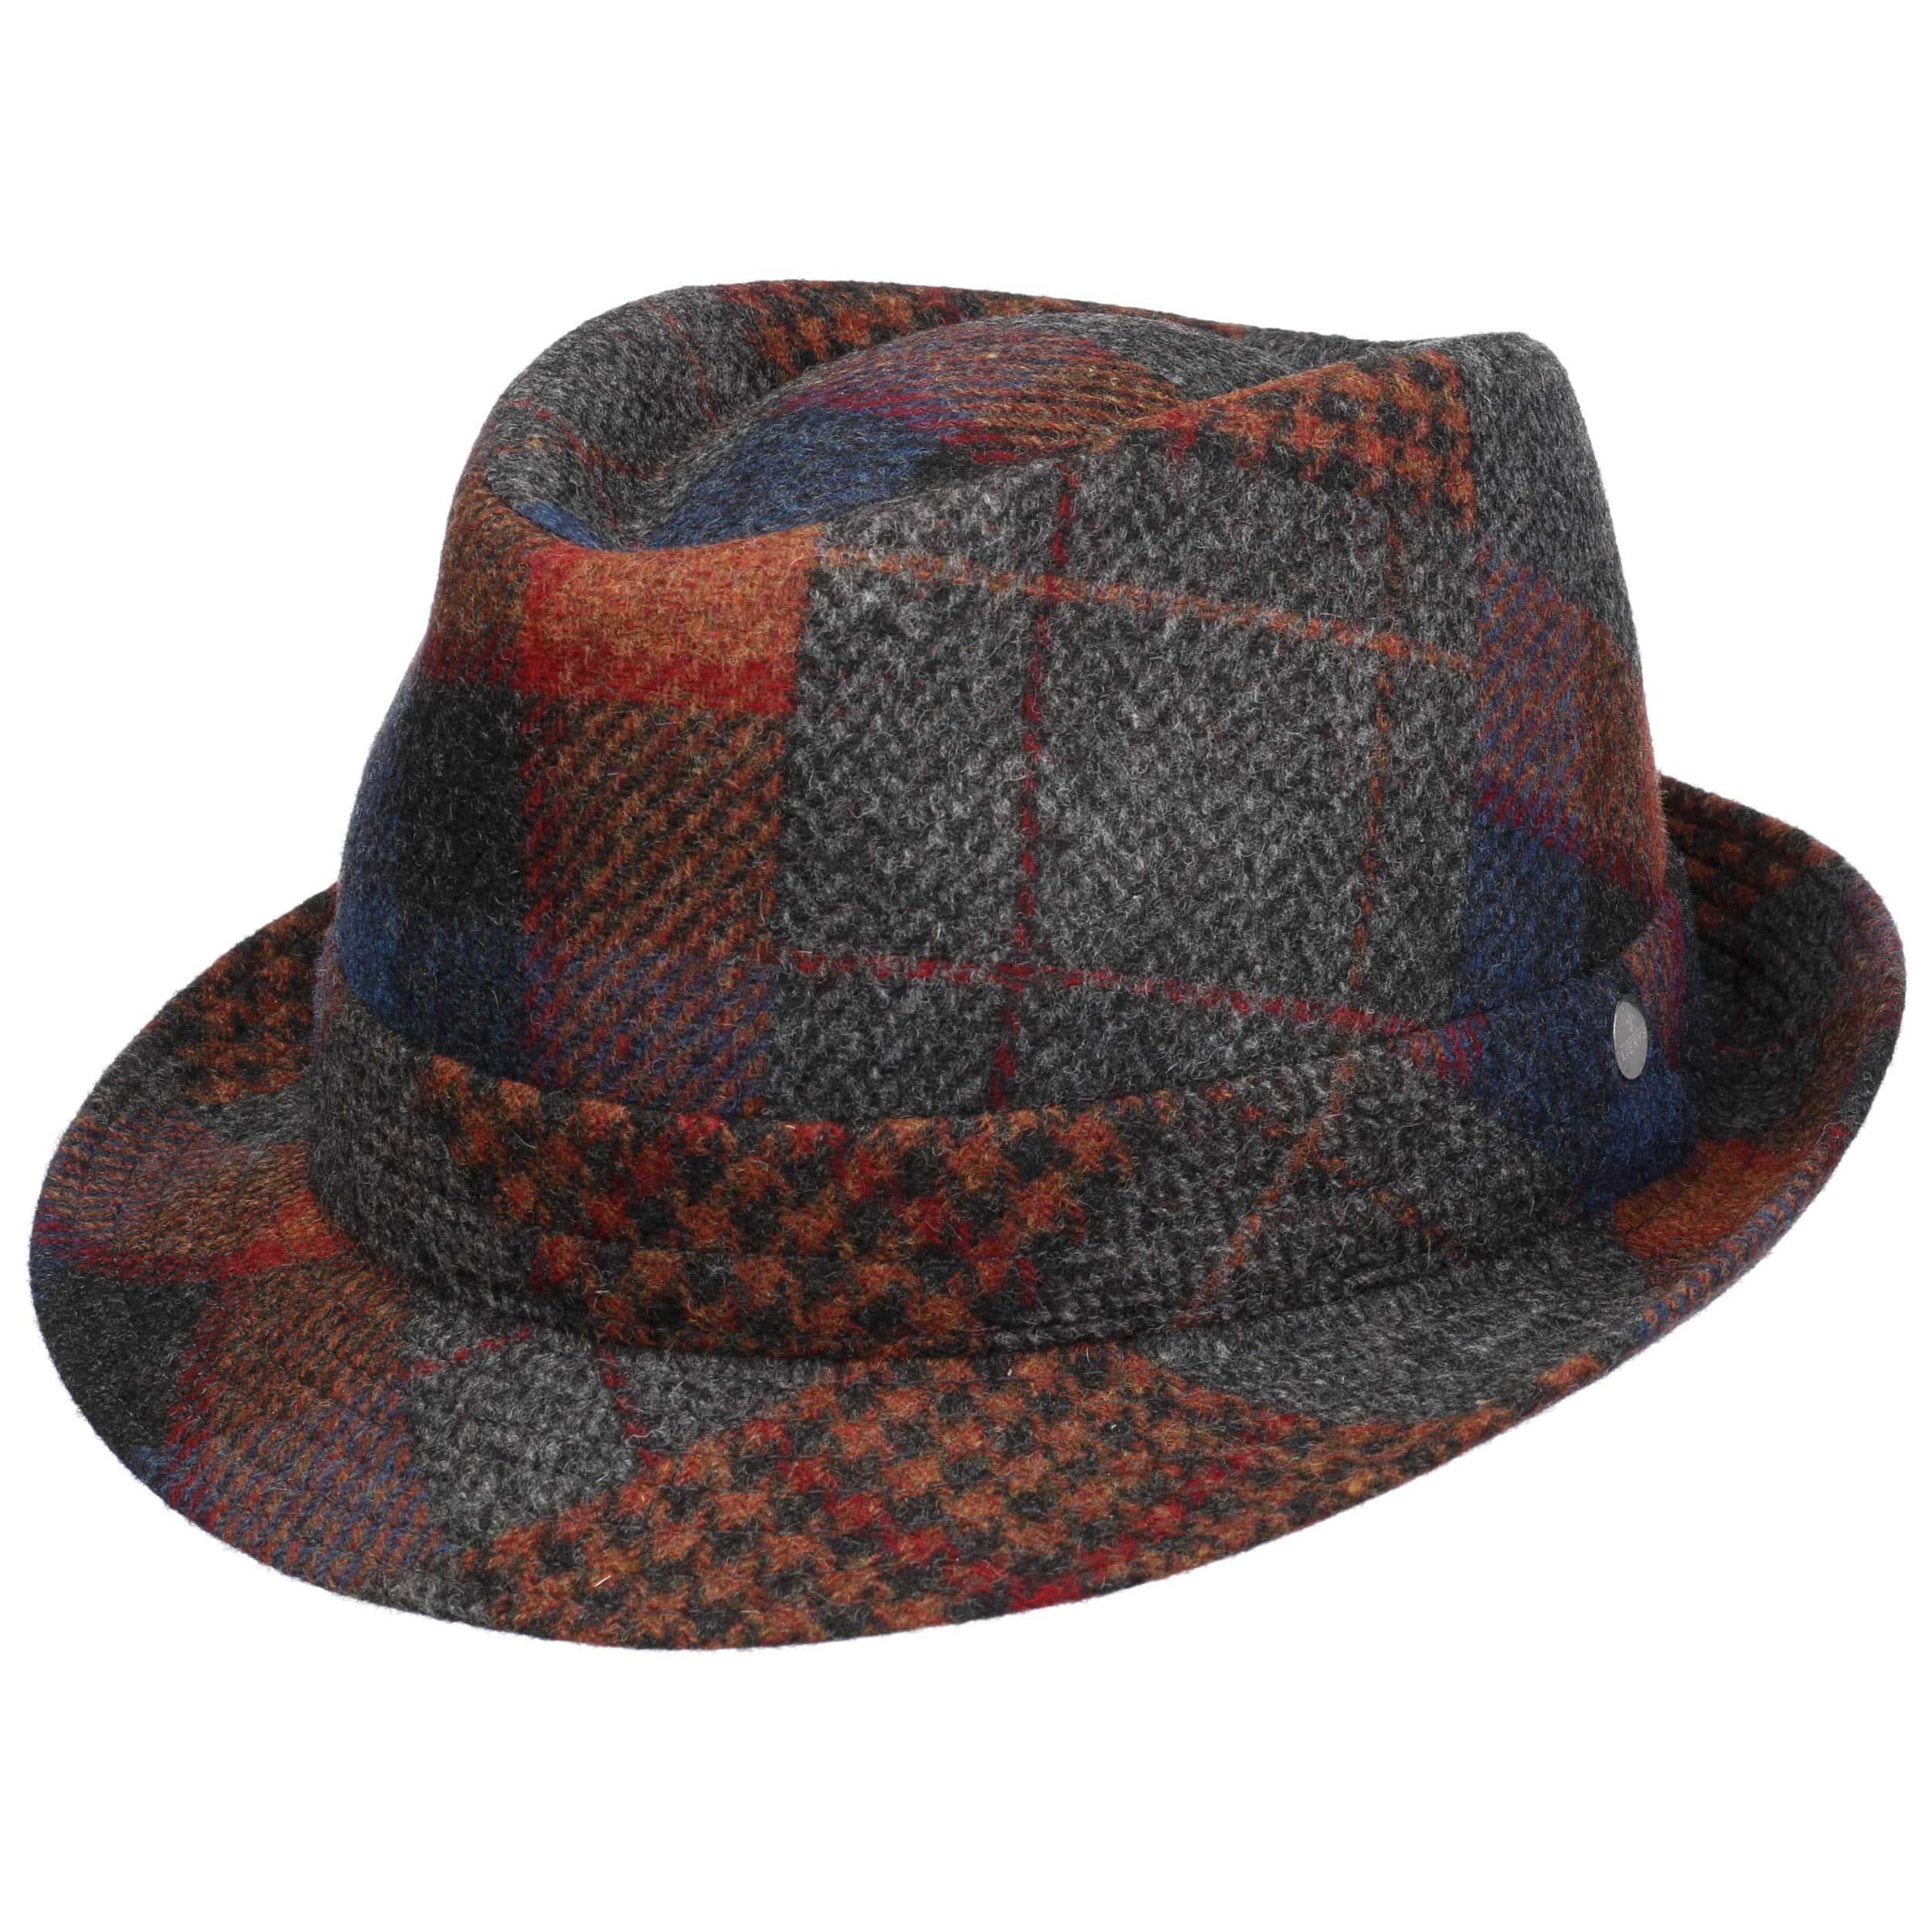 Classic Wool Trilby Hat by Lierys Rain hats Lierys 0iWYKi